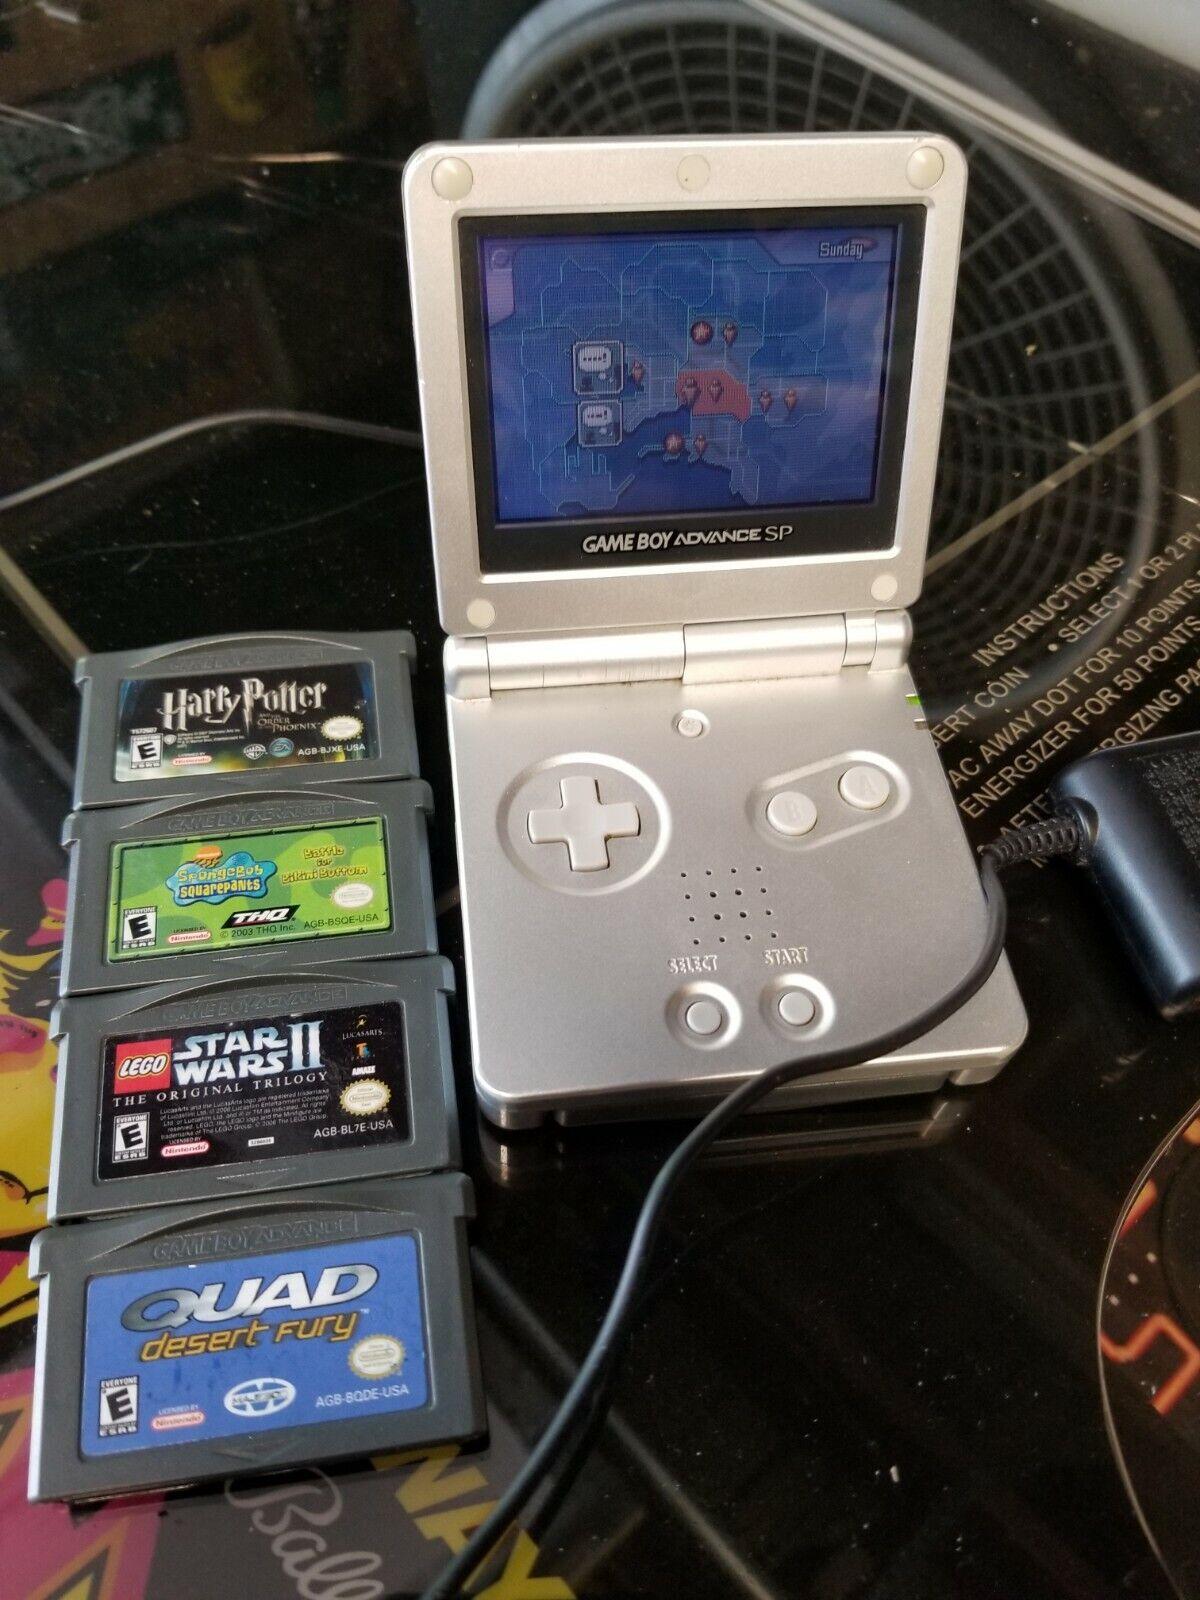 Nintendo Game Boy Advance SP Silver/Platinum Handheld System w/games on eBay thumbnail